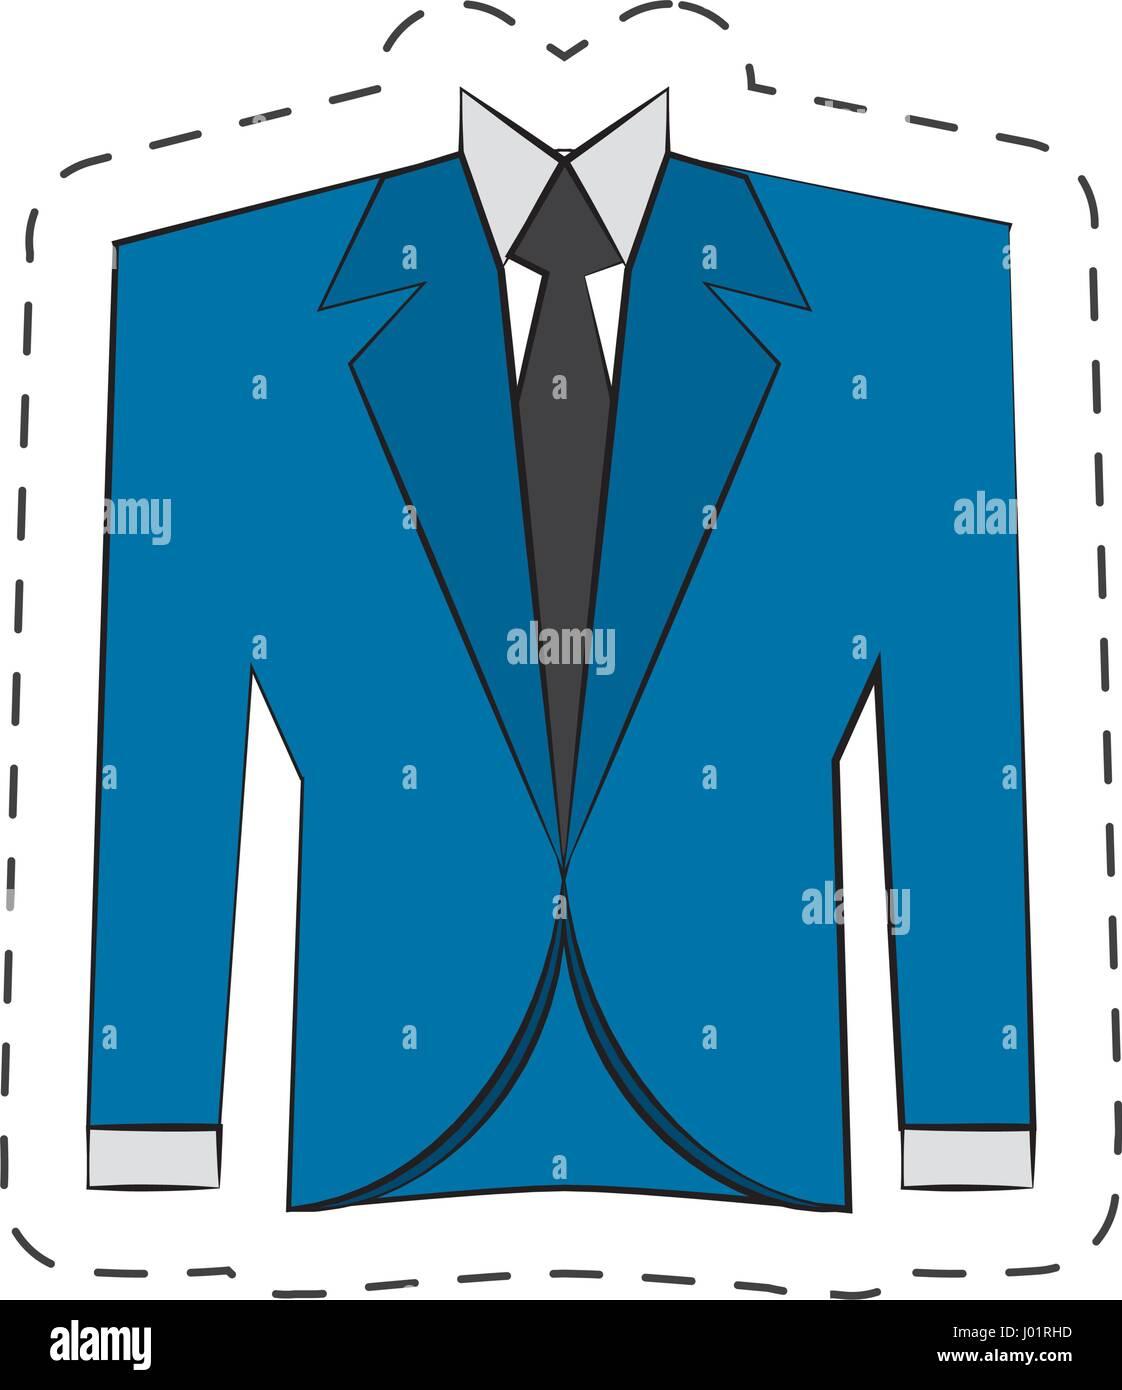 Suit Jacket Buttons Stock Photos & Suit Jacket Buttons Stock Images ...